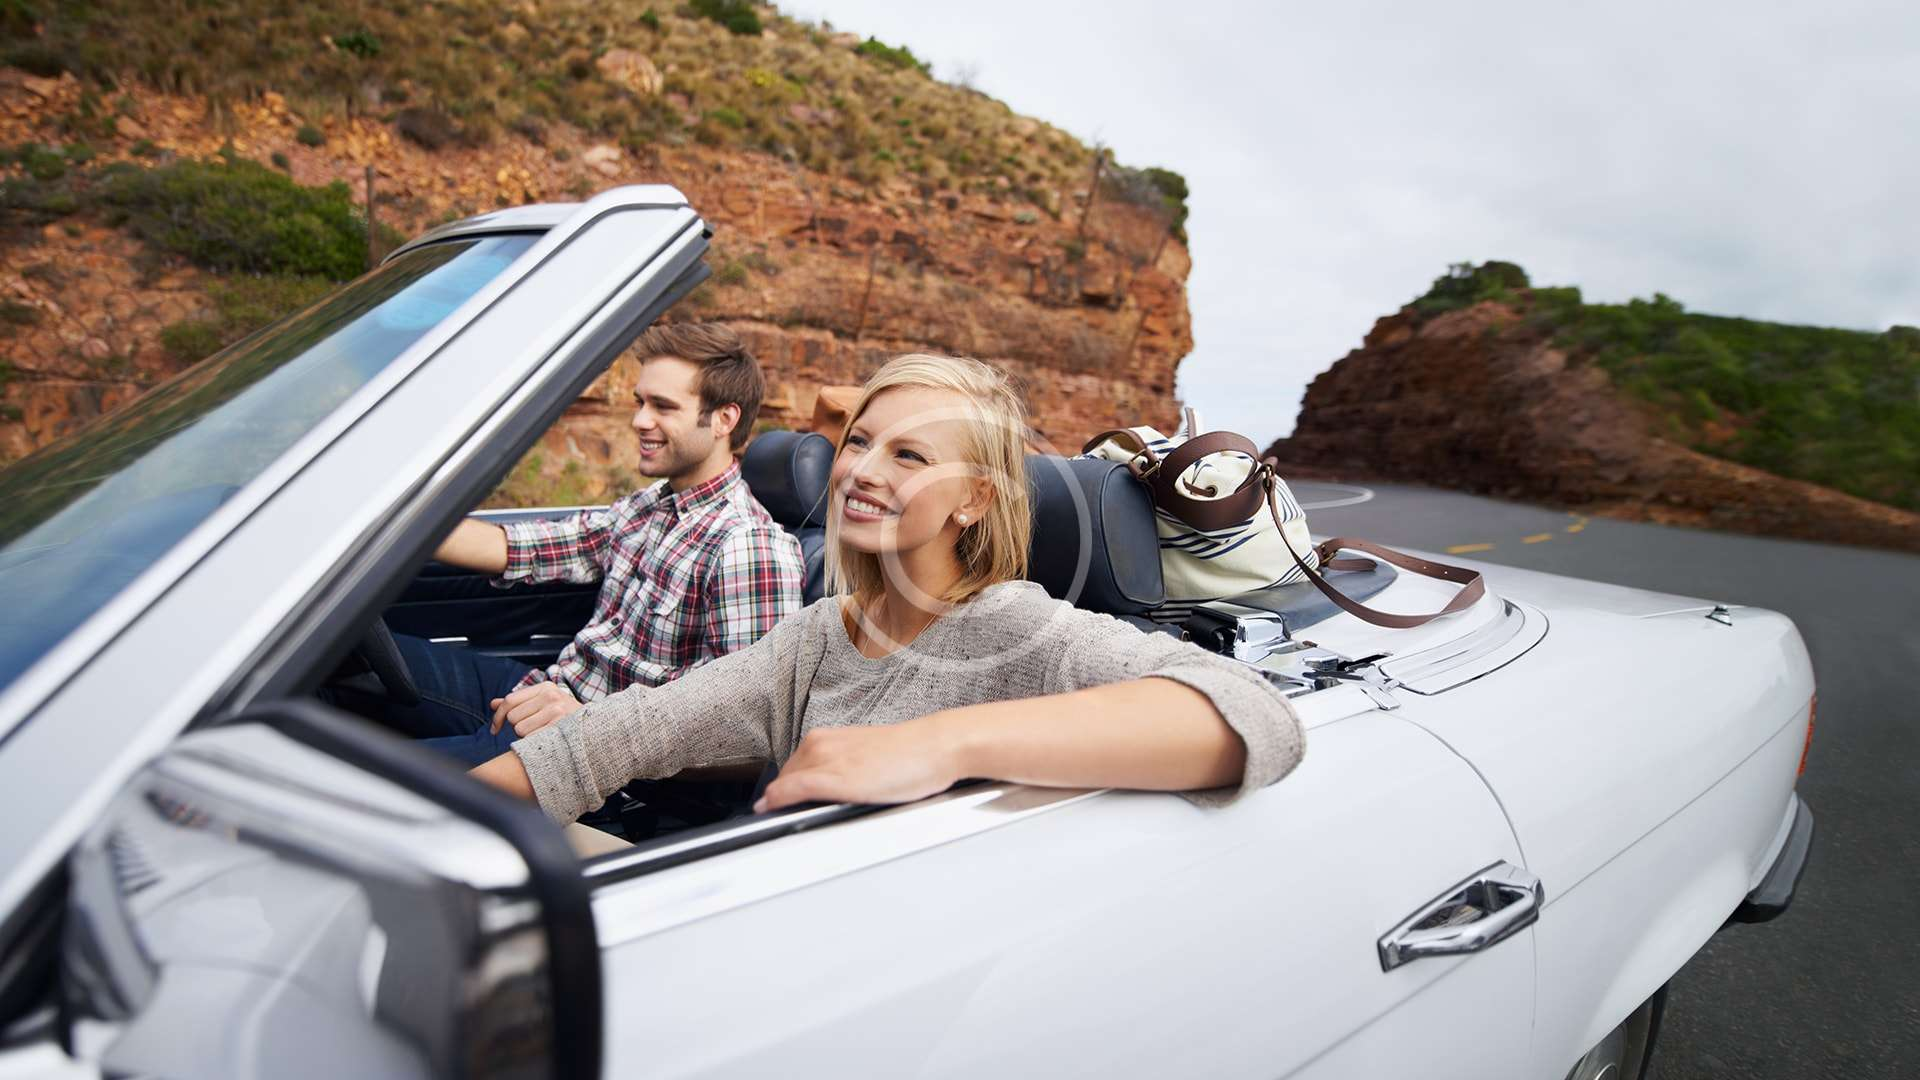 Finding Cheap Rental Cars